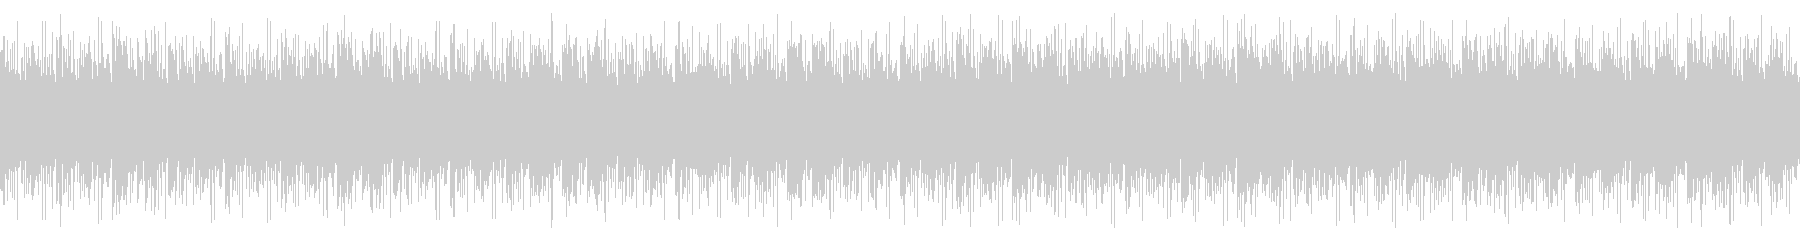 100bpm Looped Ambient Positive Gentle's unreproduced waveform